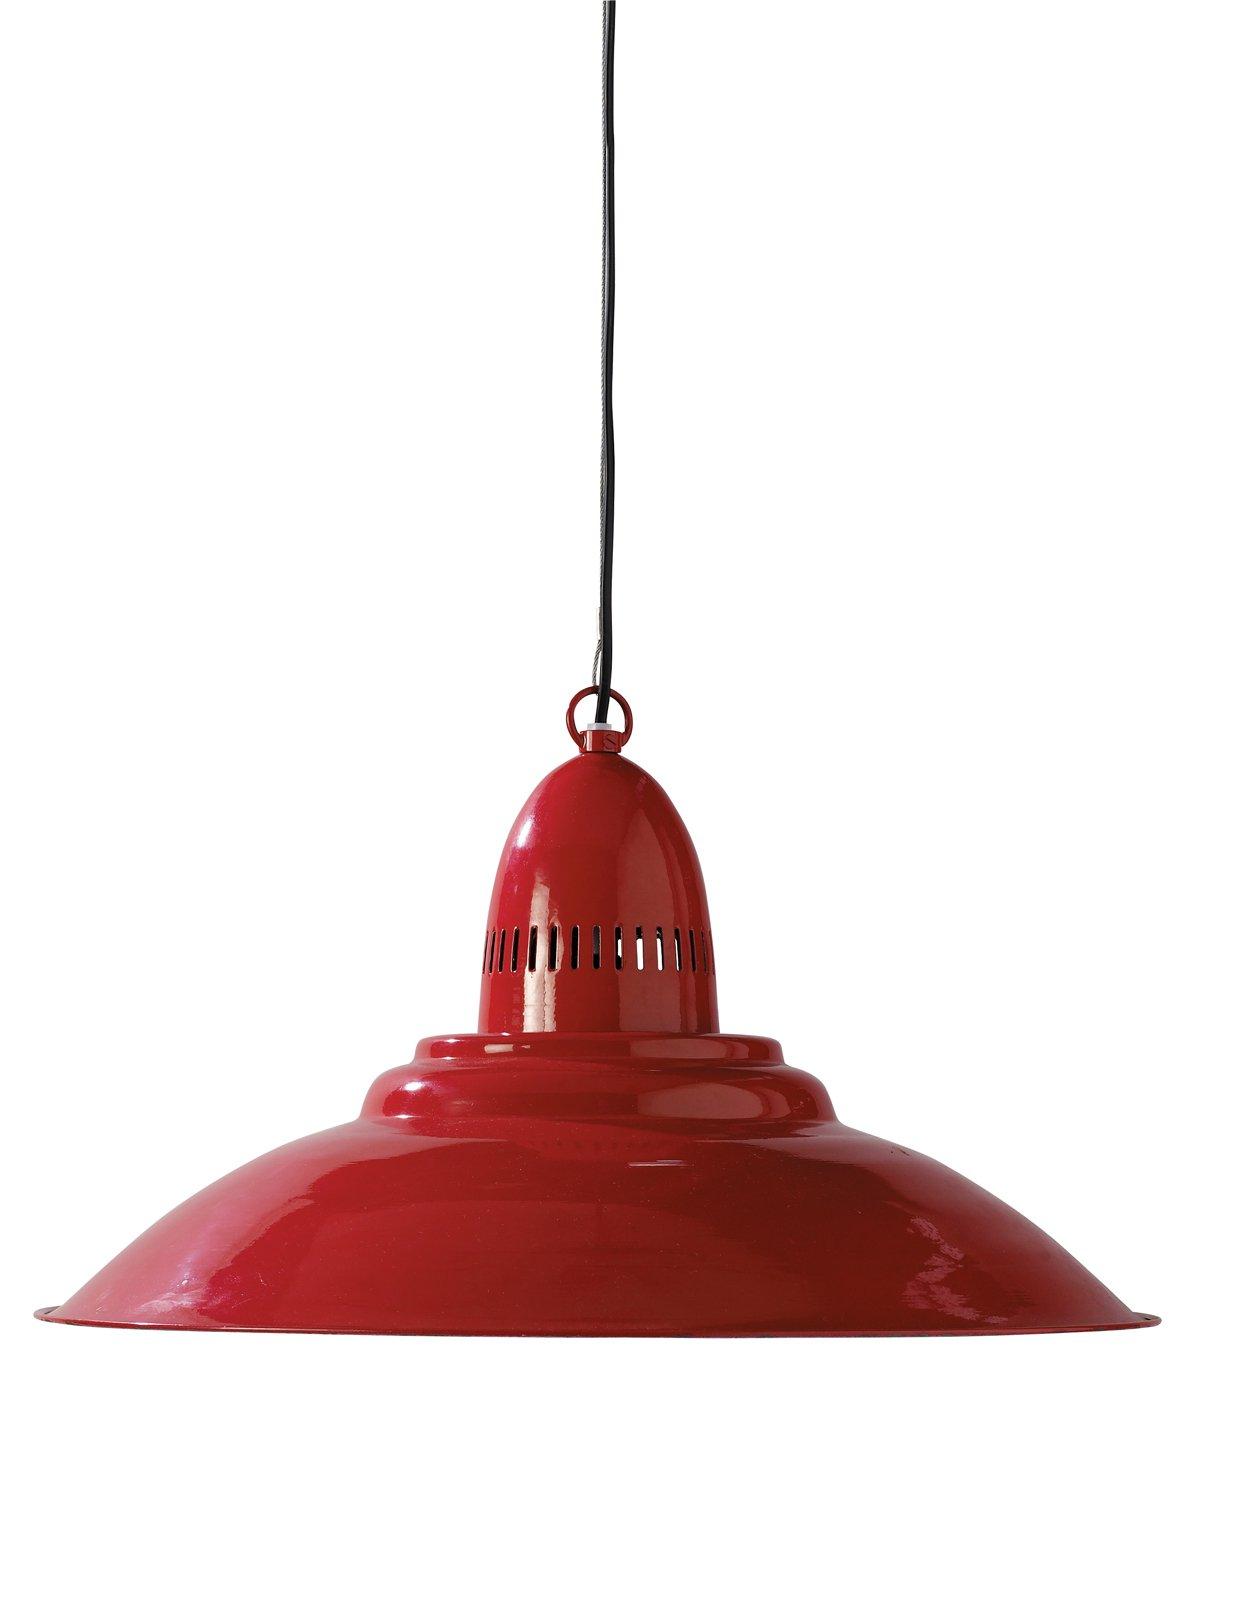 La Lampada A Sospensione Comptoir Di Maisons Du Monde Ha Un Sapore  #7E211B 1254 1600 Sedie Sala Da Pranzo Maison Du Monde